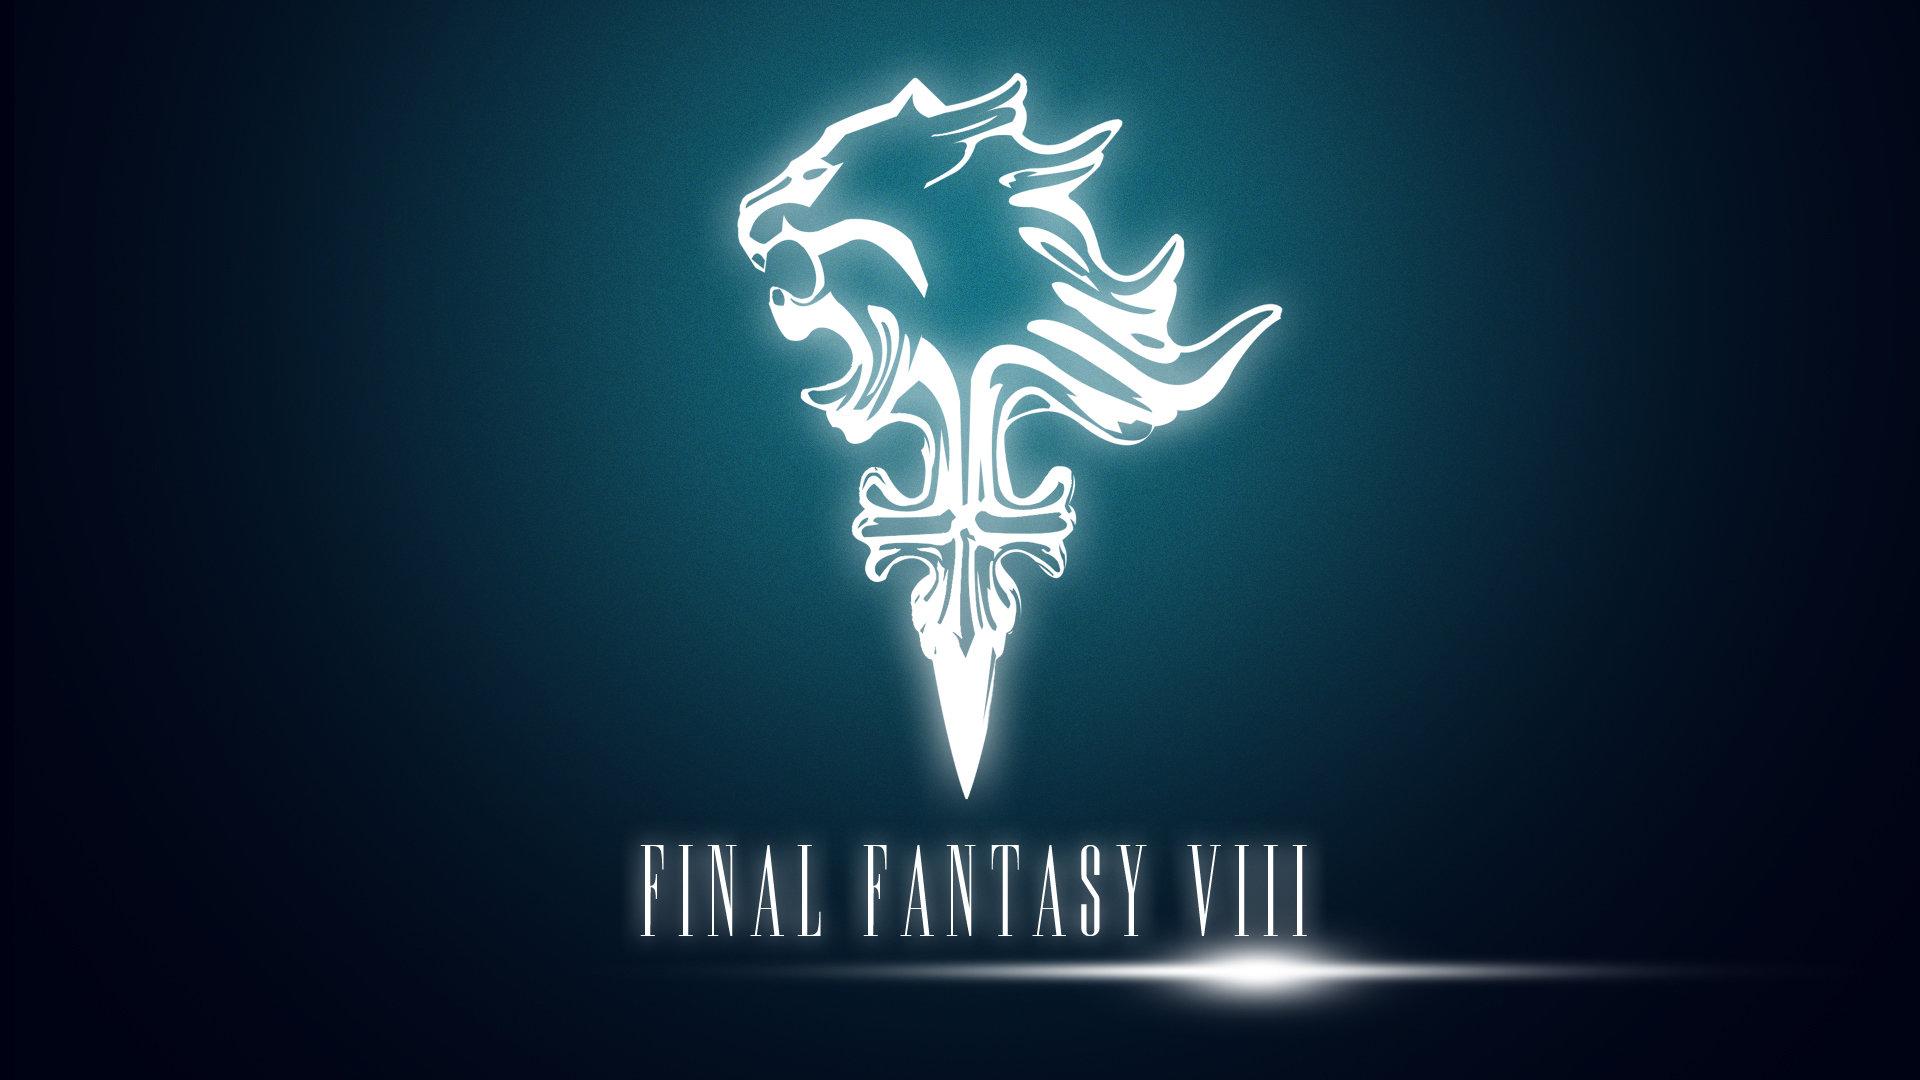 Final Fantasy Viii Ff8 Wallpapers Hd For Desktop Backgrounds